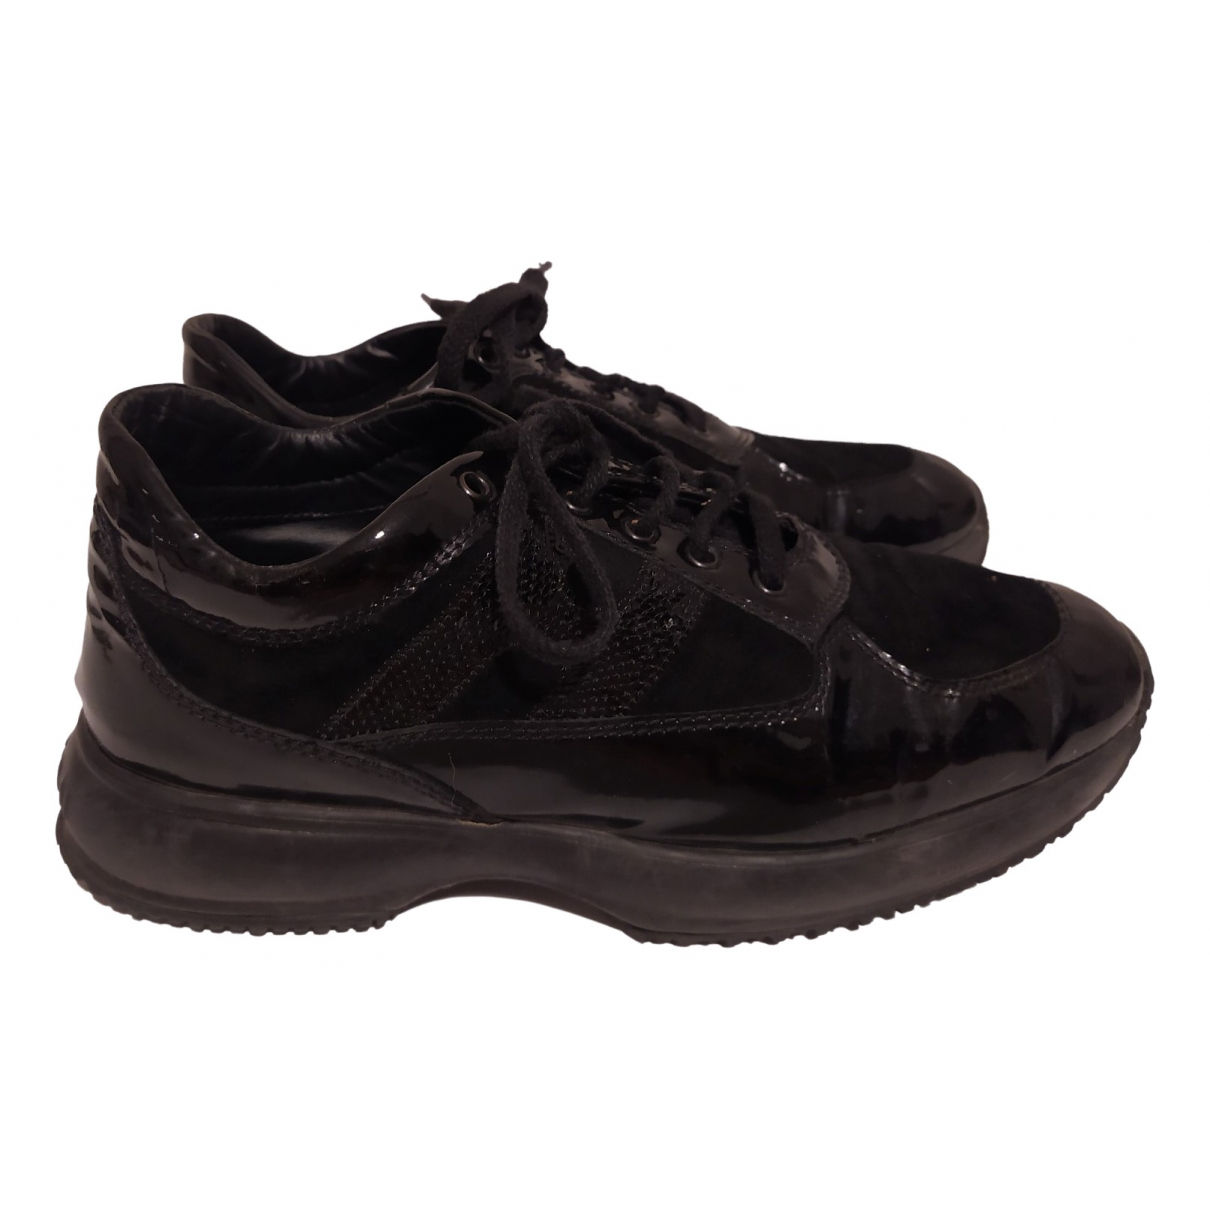 Hogan \N Black Patent leather Trainers for Women 35 EU